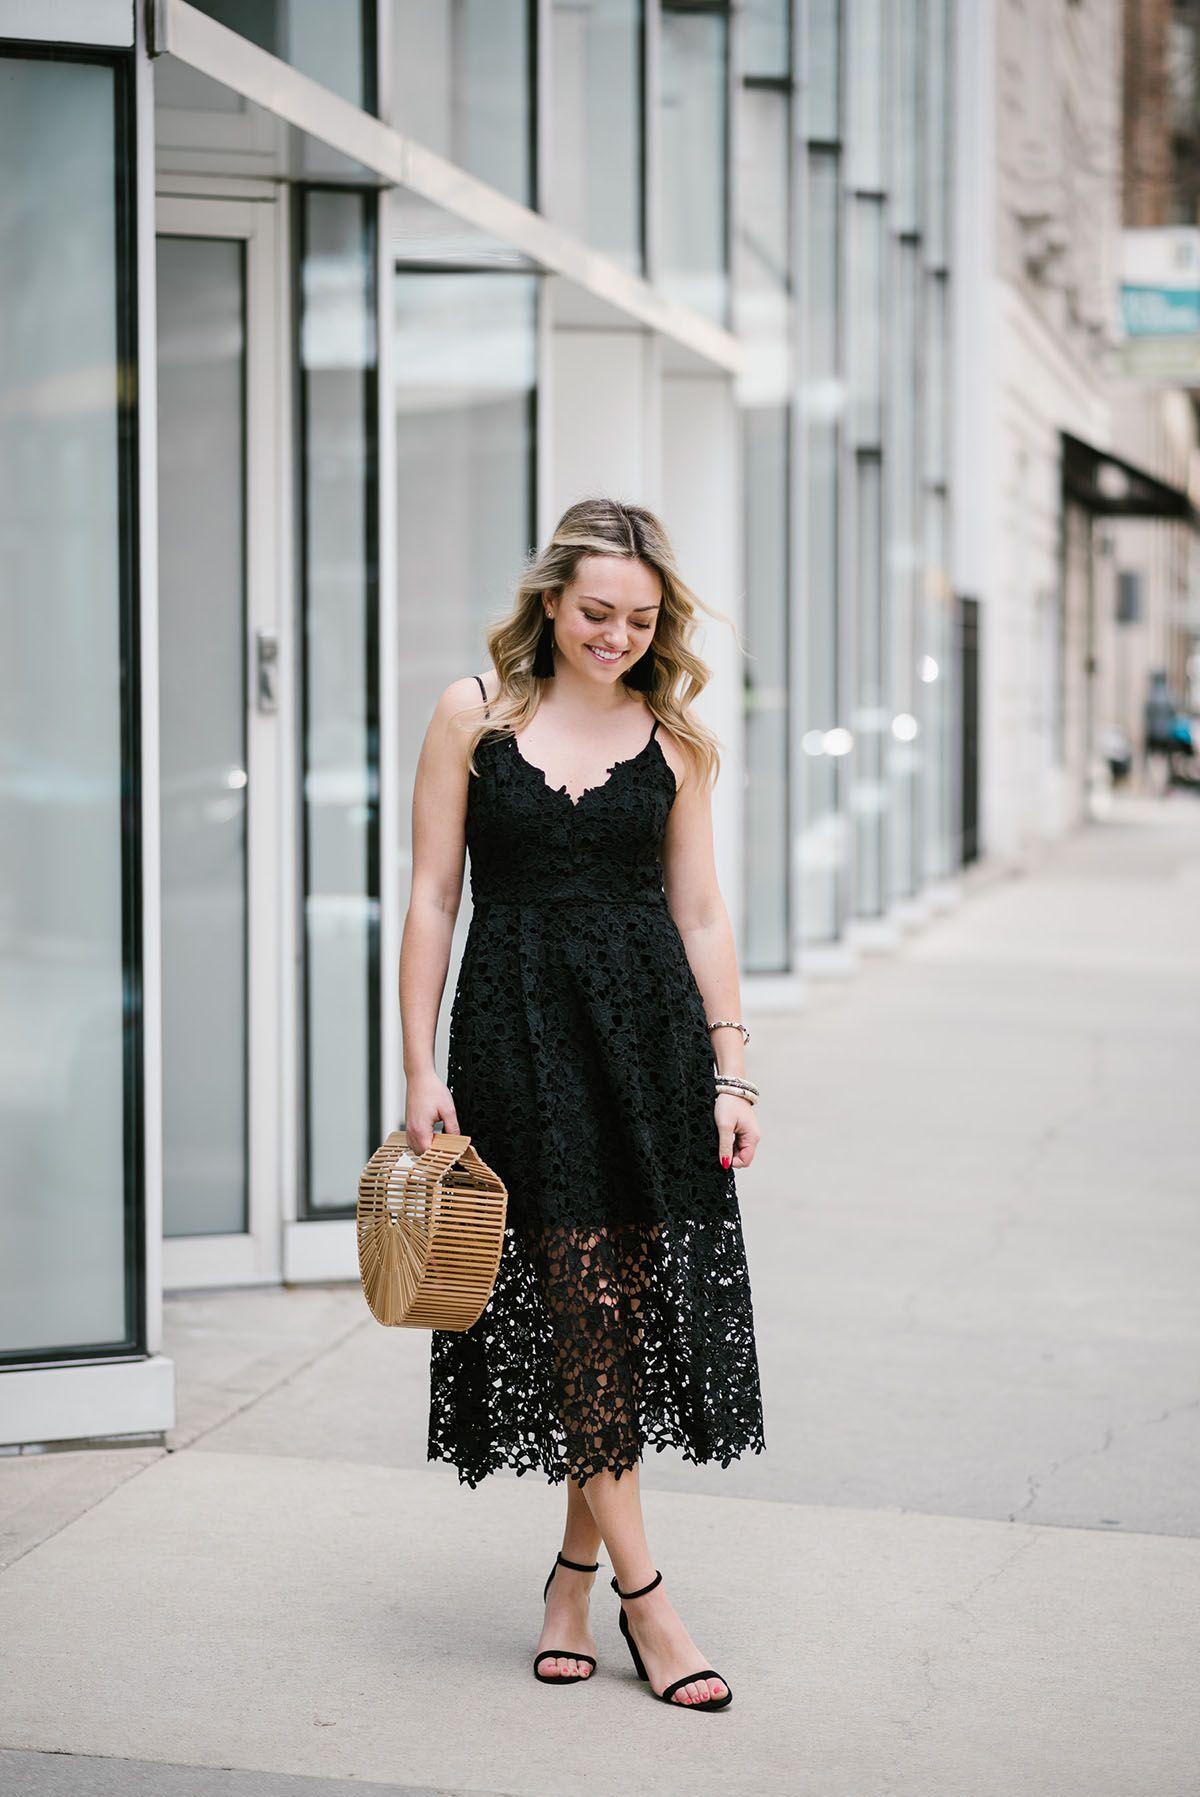 Summer Wedding Guest Black Lace Midi Dress Fashionista Black